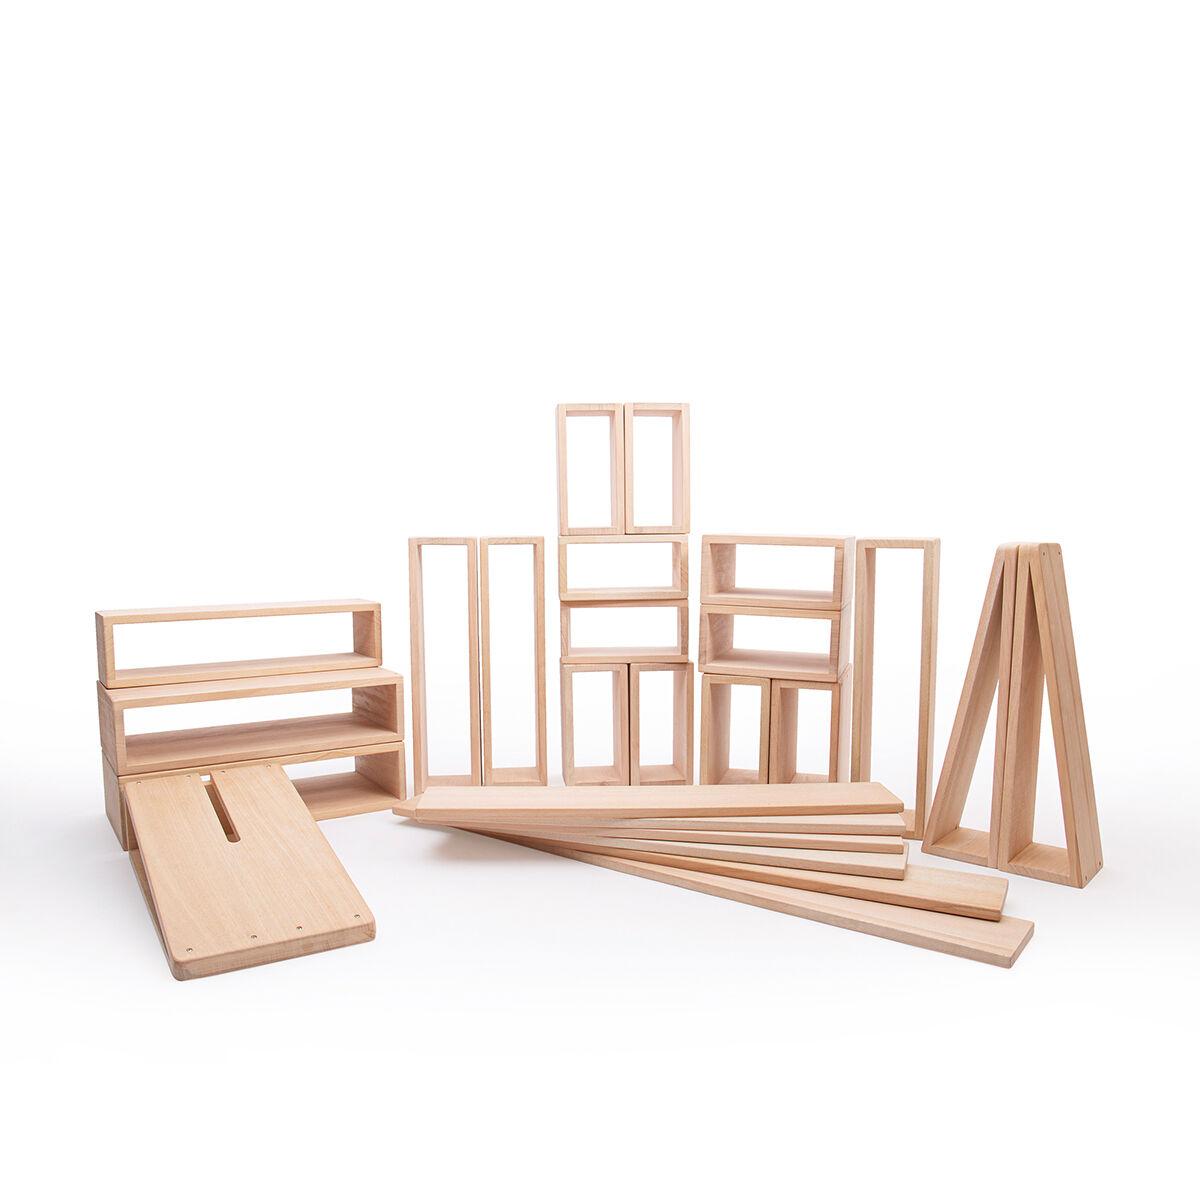 Guidecraft Outdoor Wooden Hollow Blocks